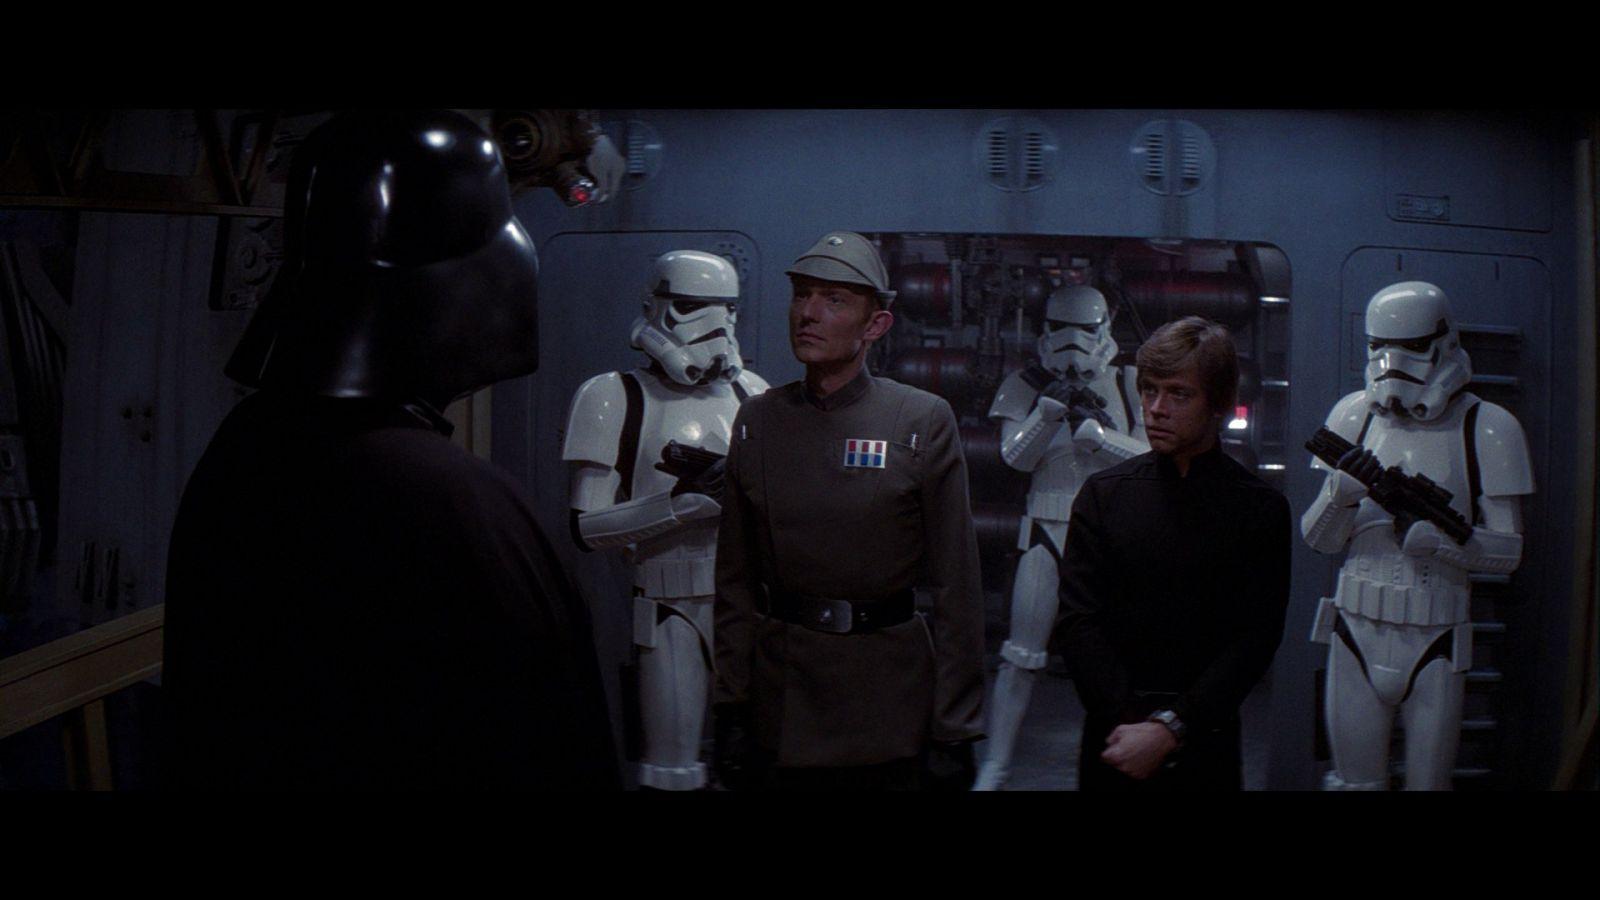 Star Wars Return of the Jedi Bluray Capture-23.jpg